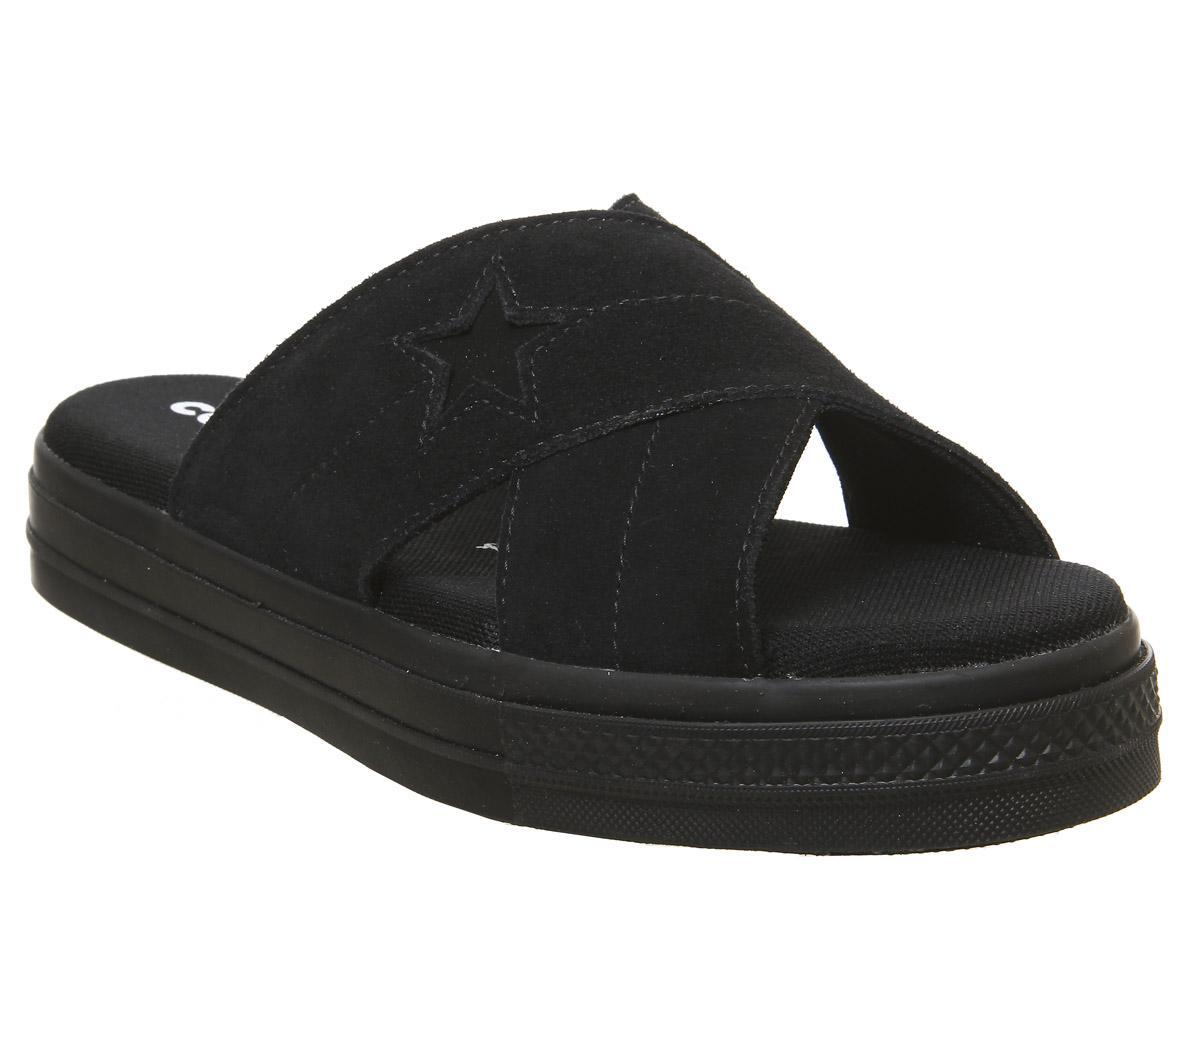 Converse One Star Sandals